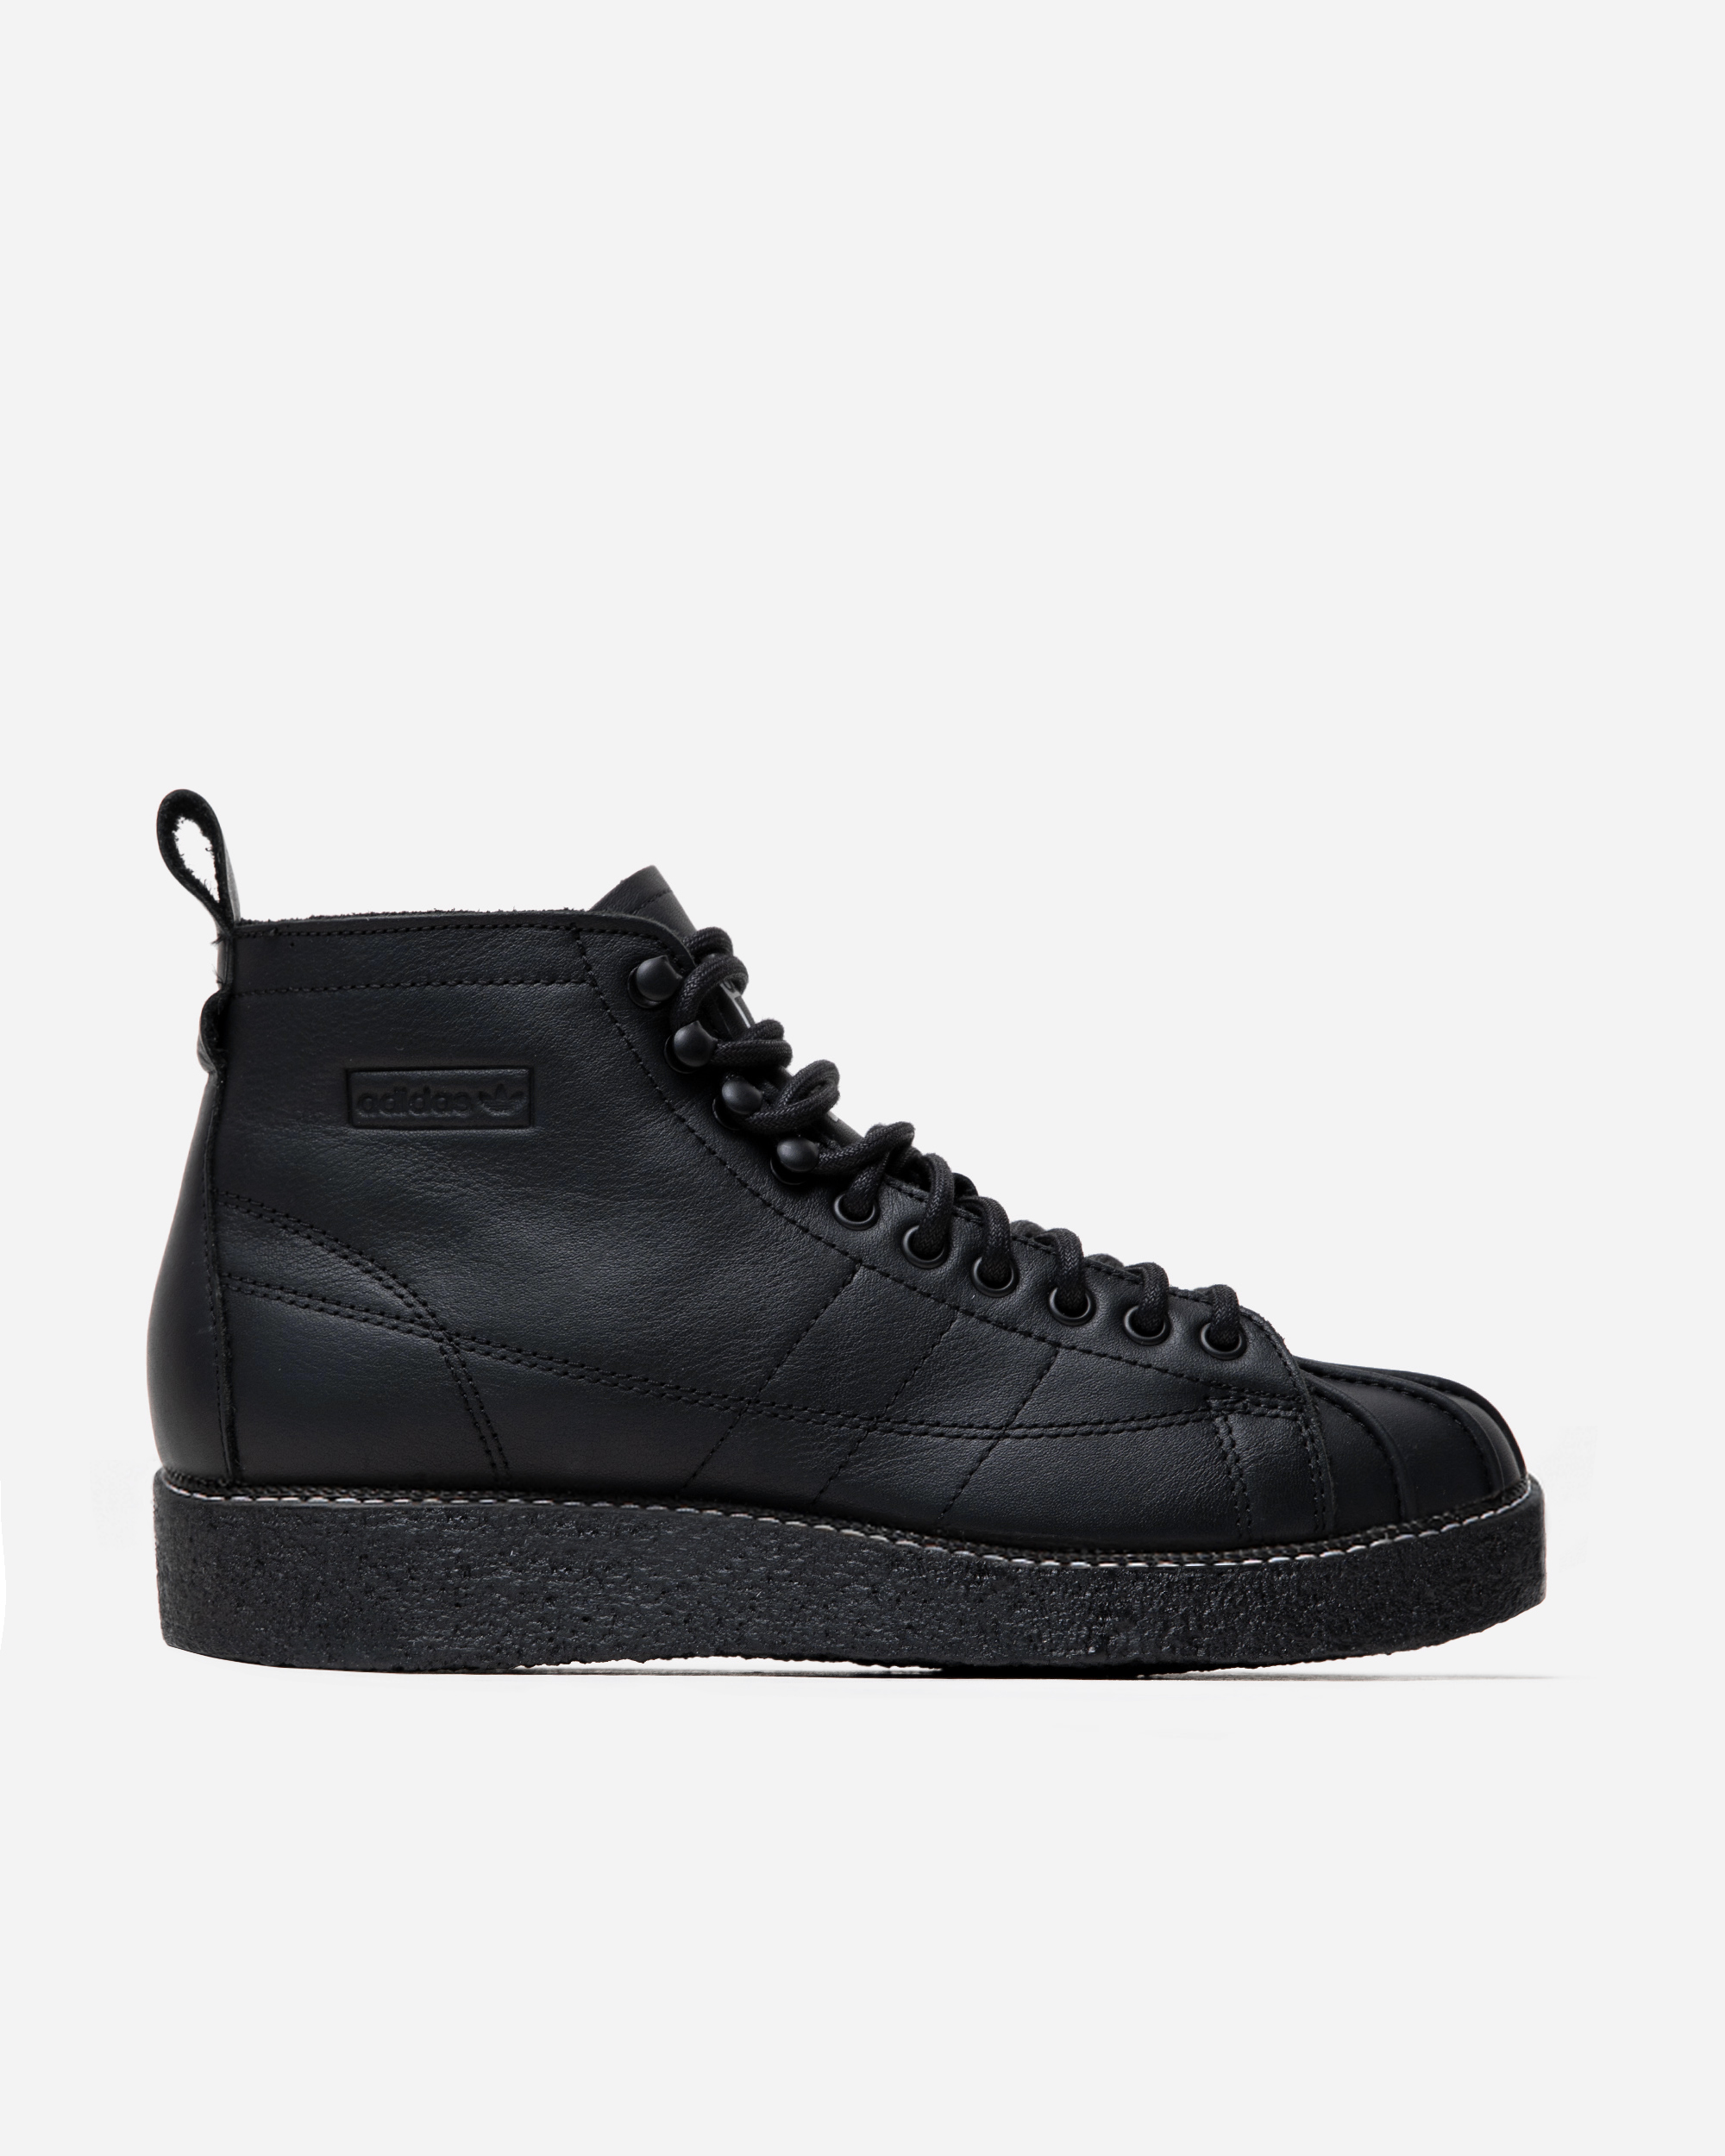 Adidas Originals Superstar Boot Luxe